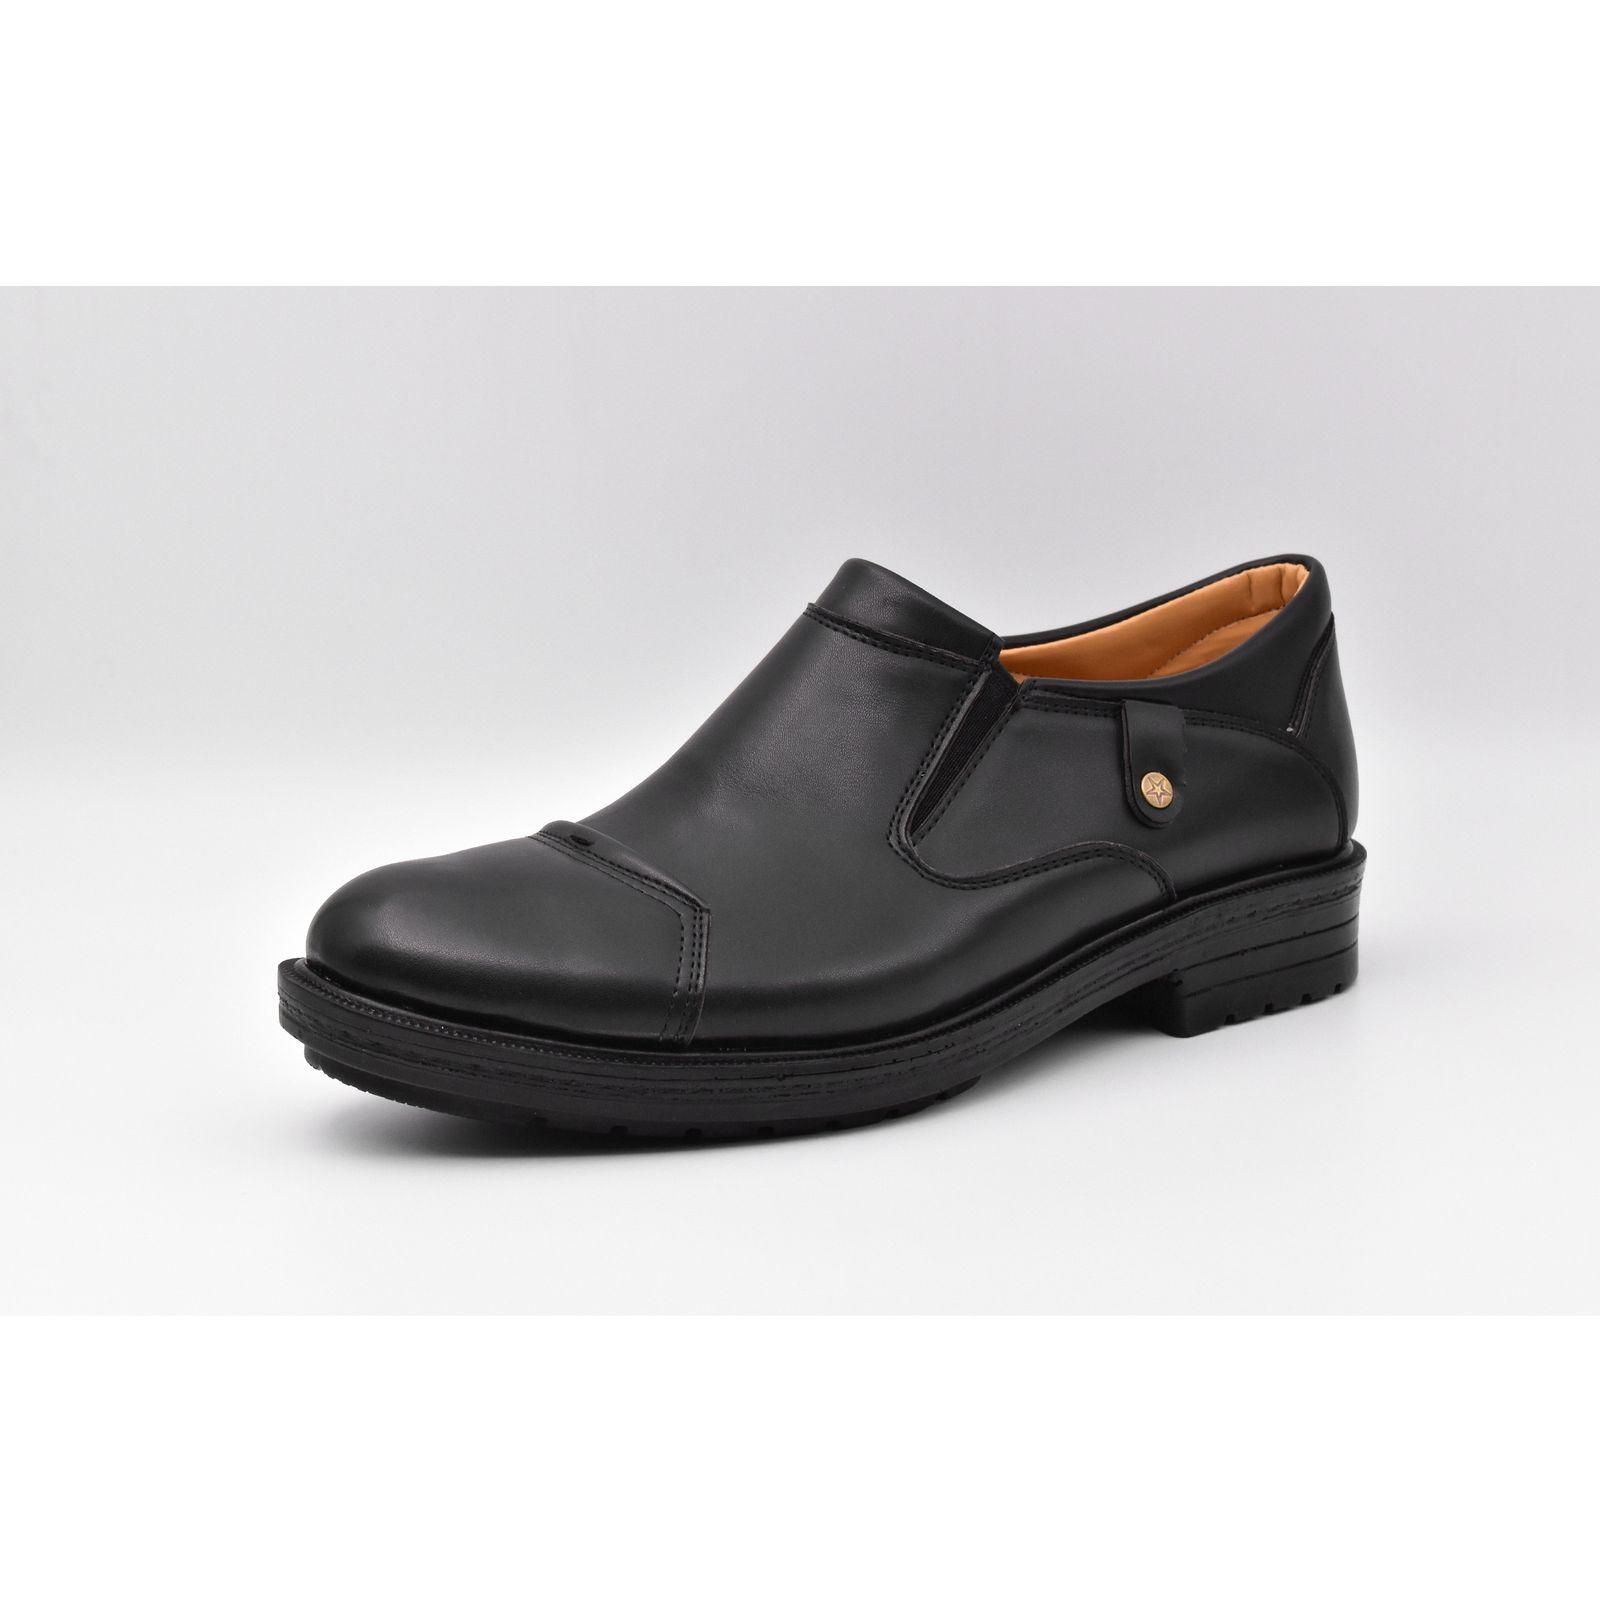 کفش مردانه سینگل مدل سهیل کد 6510 -  - 5